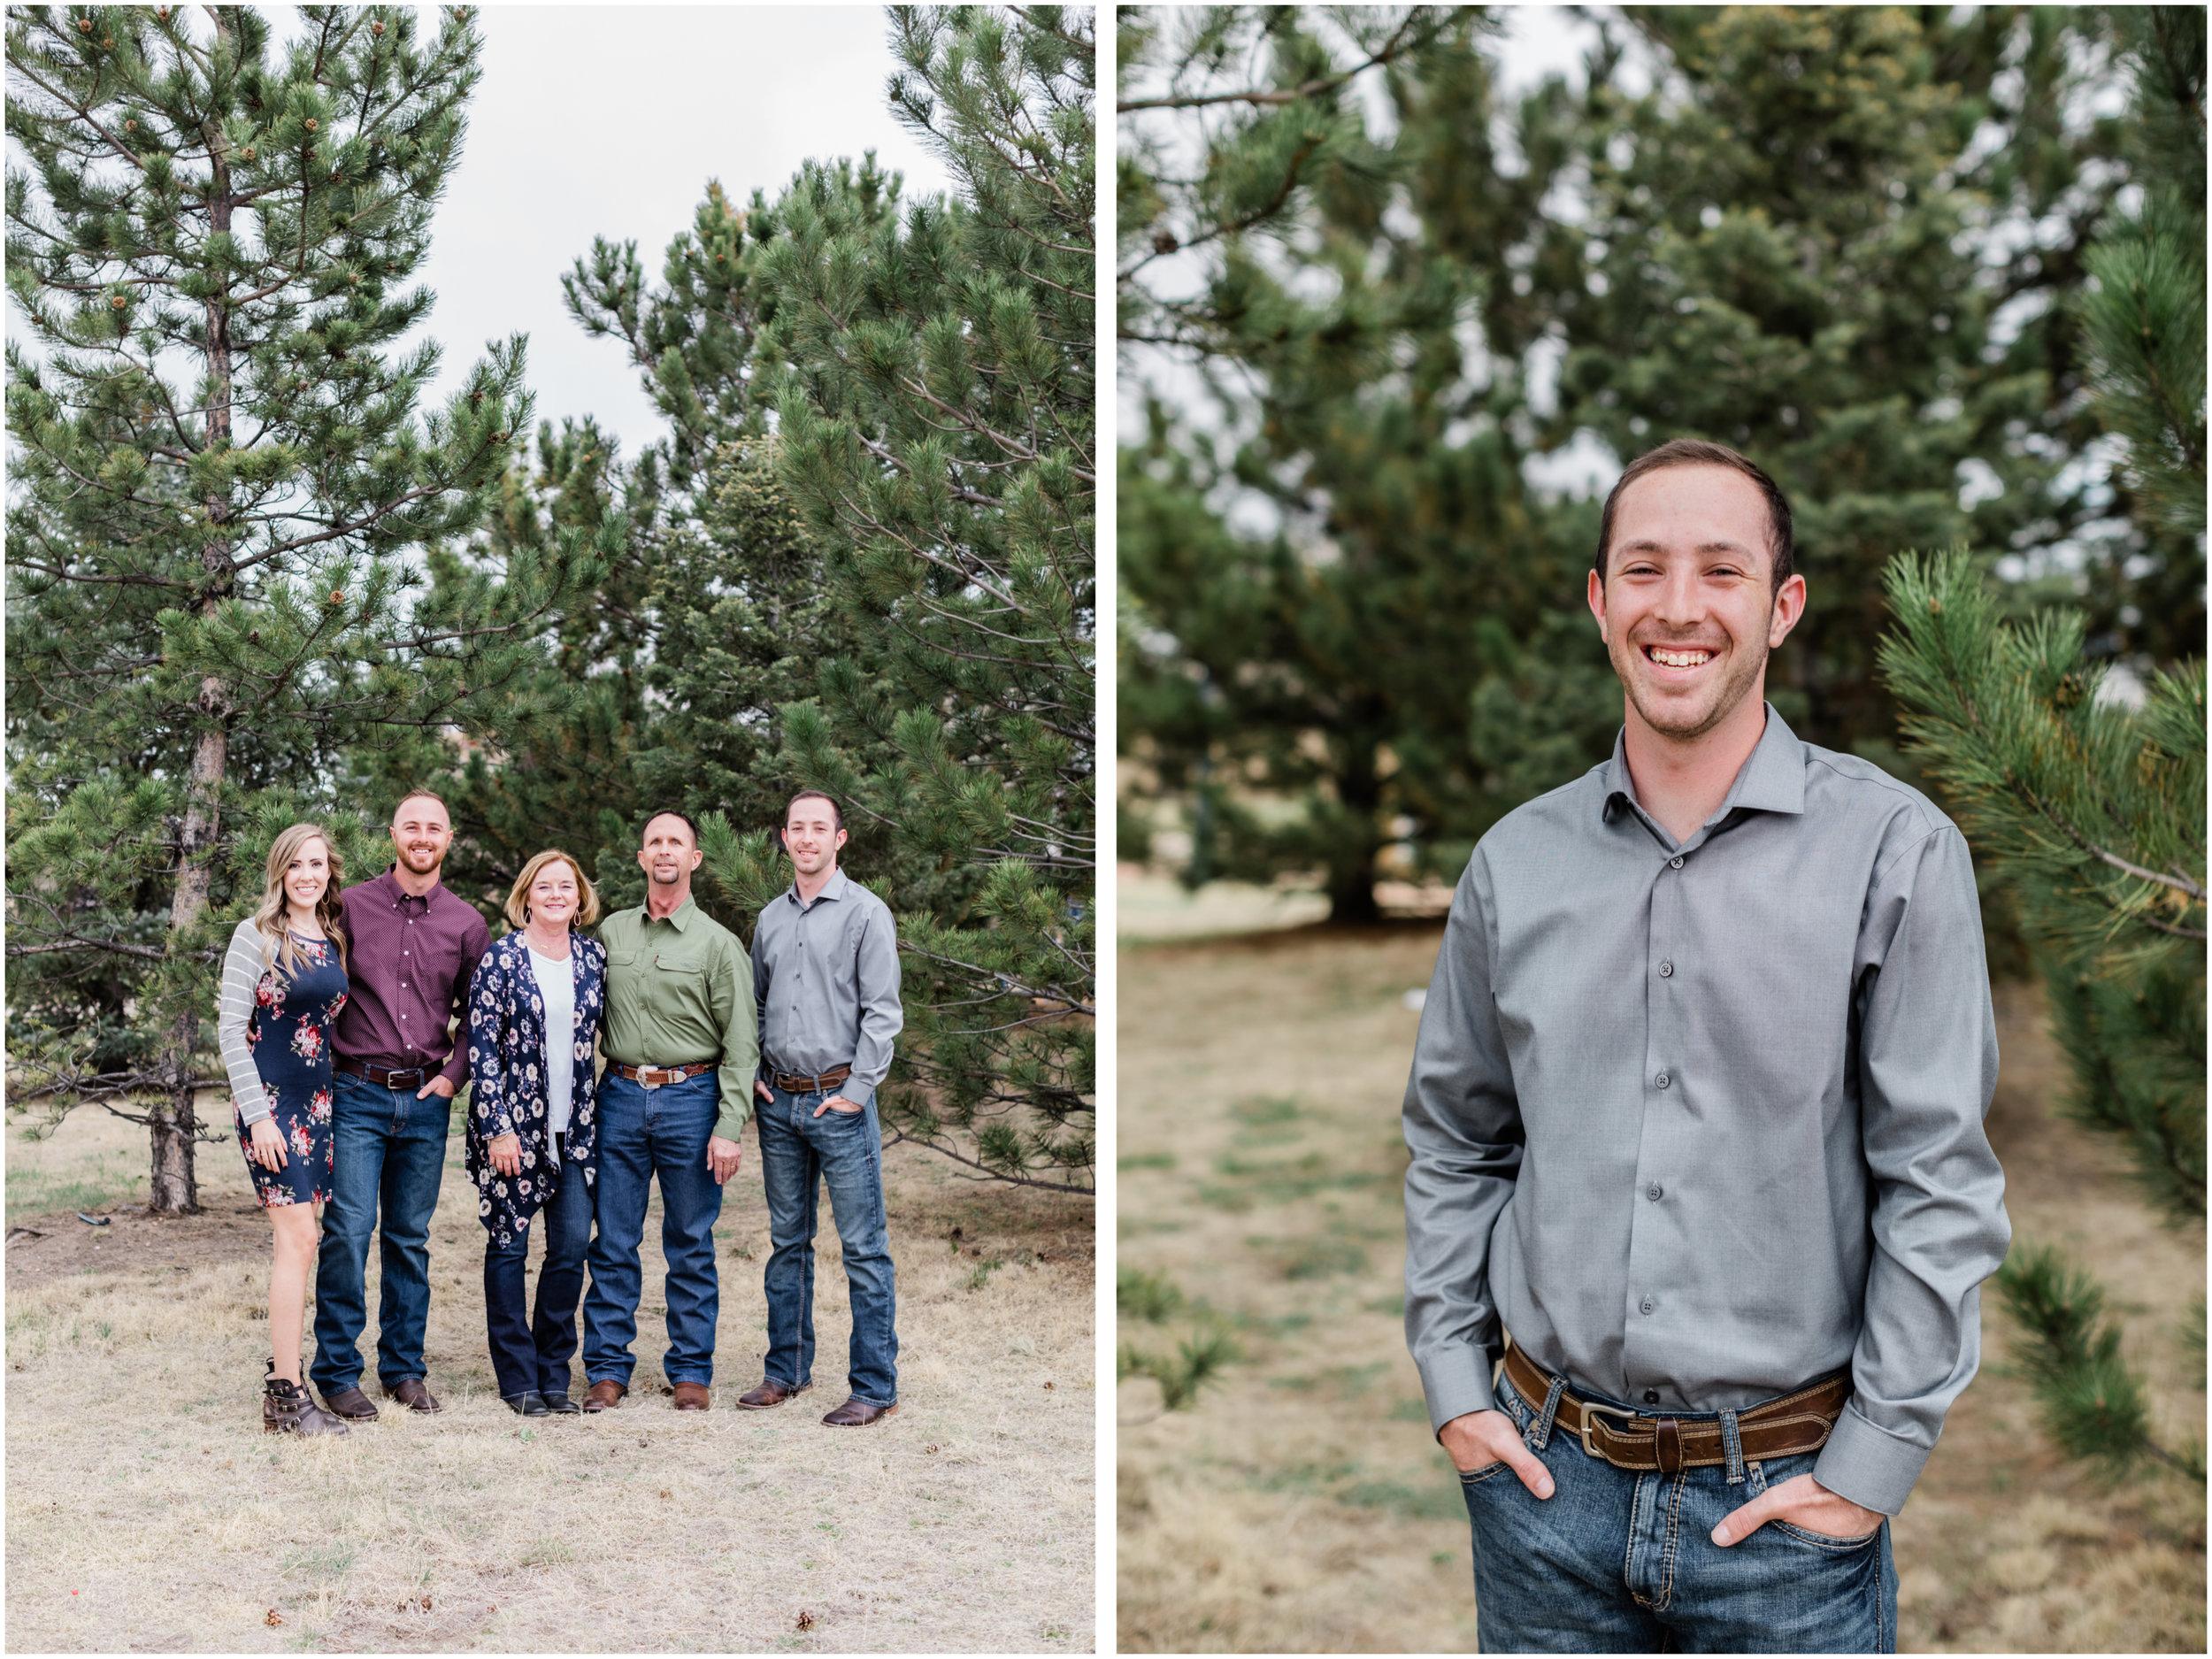 Colorado Springs Family Photographer 1.jpg